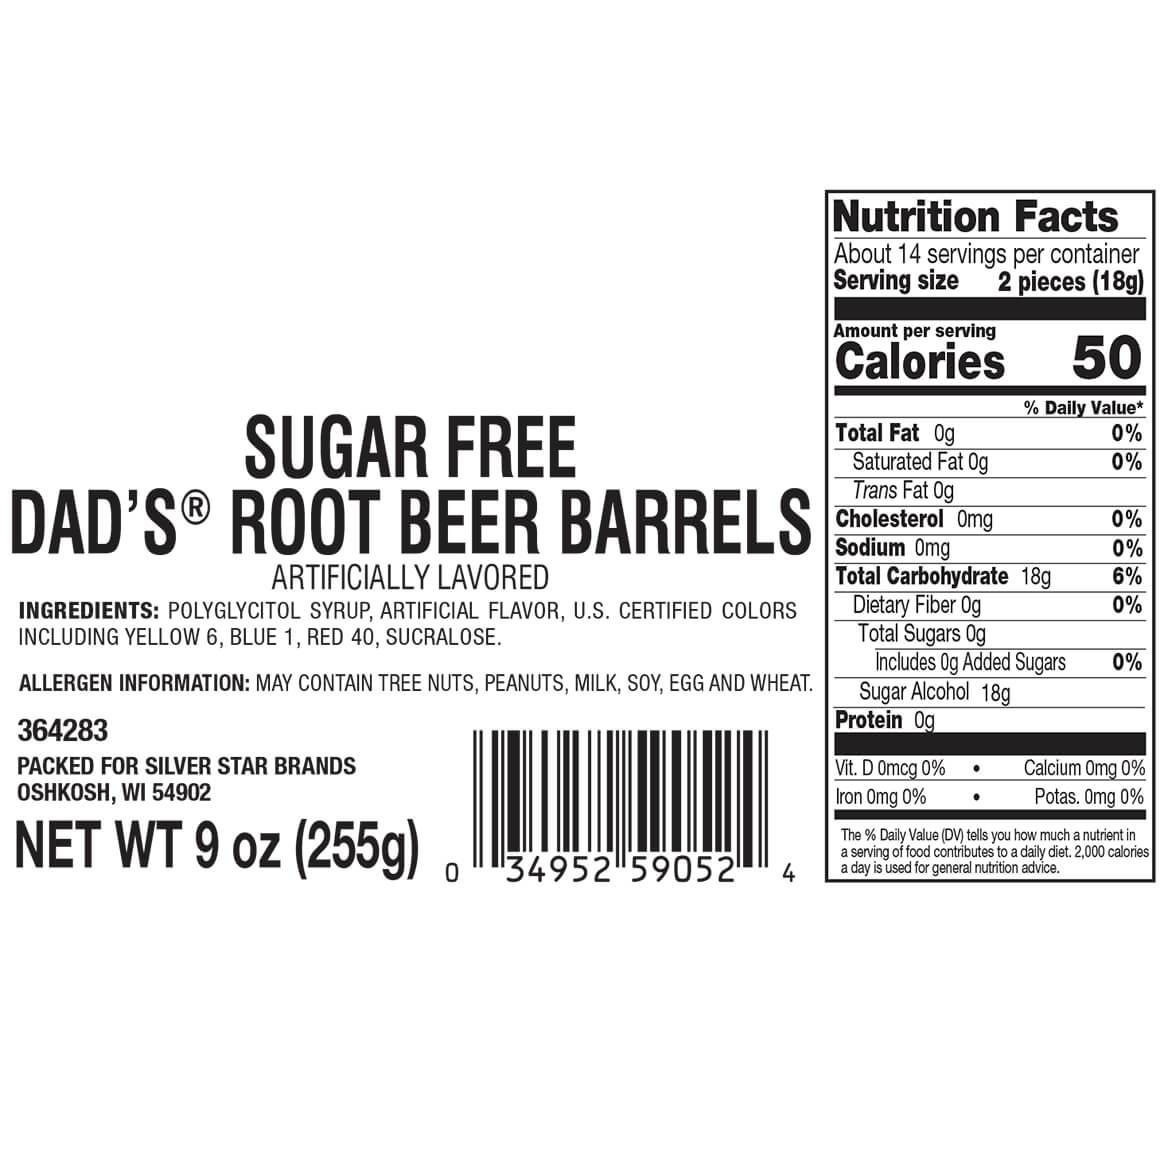 Sugar-Free Dad's® Rootbeer Barrels, 9 oz.-364283